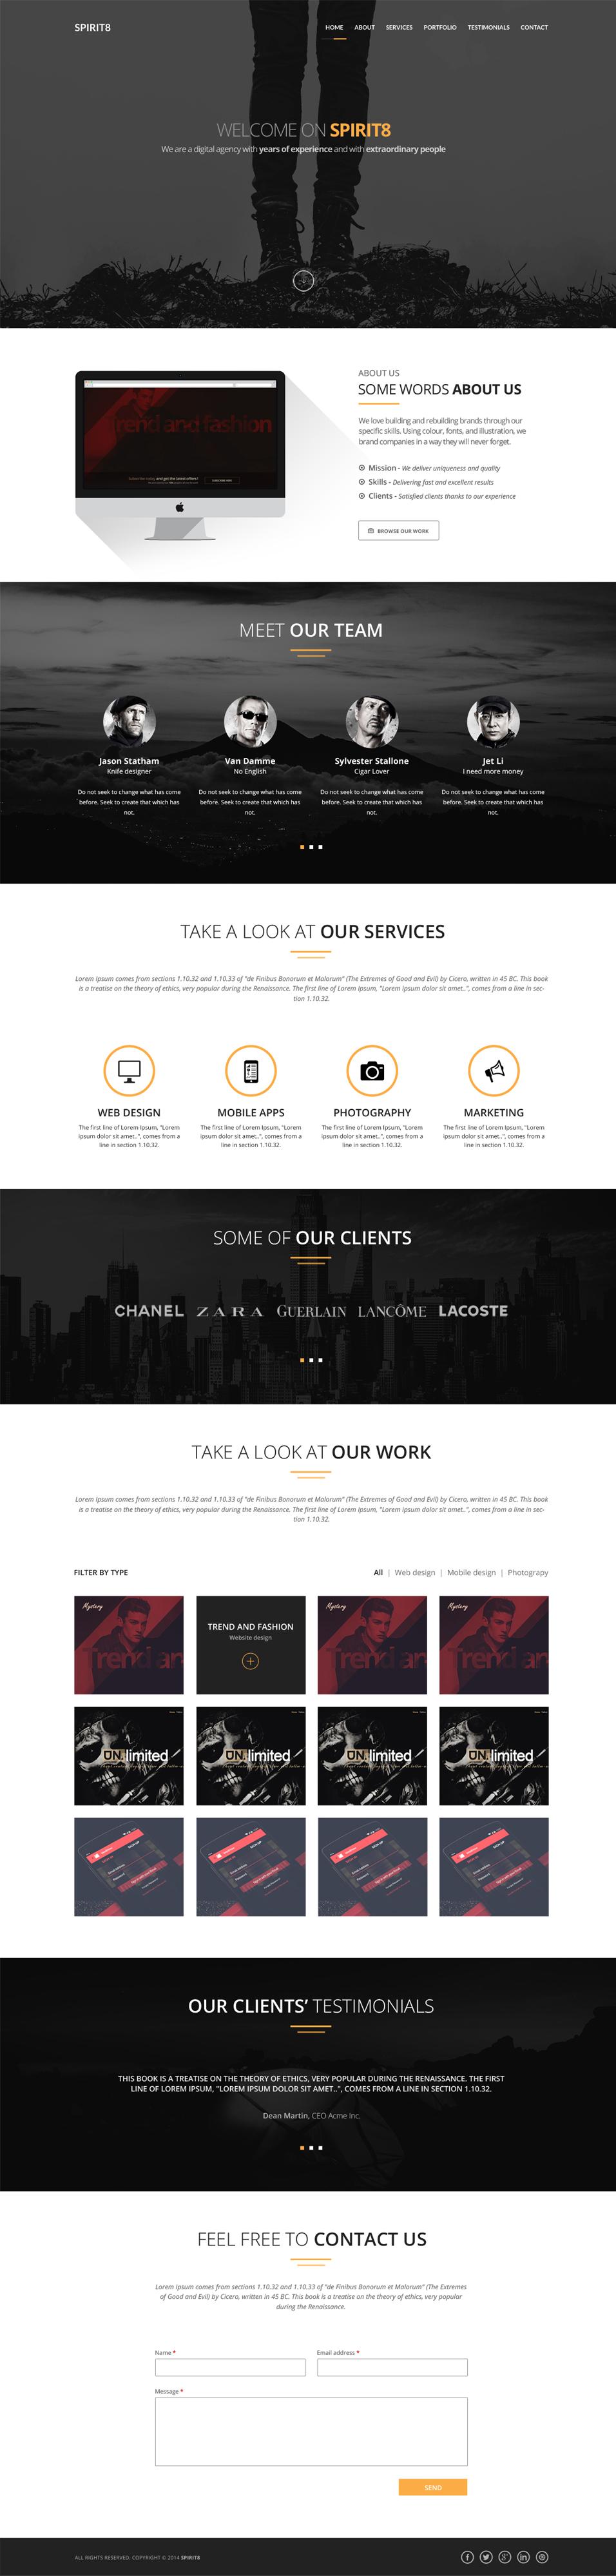 spirit8 digital agency one page template psd web design